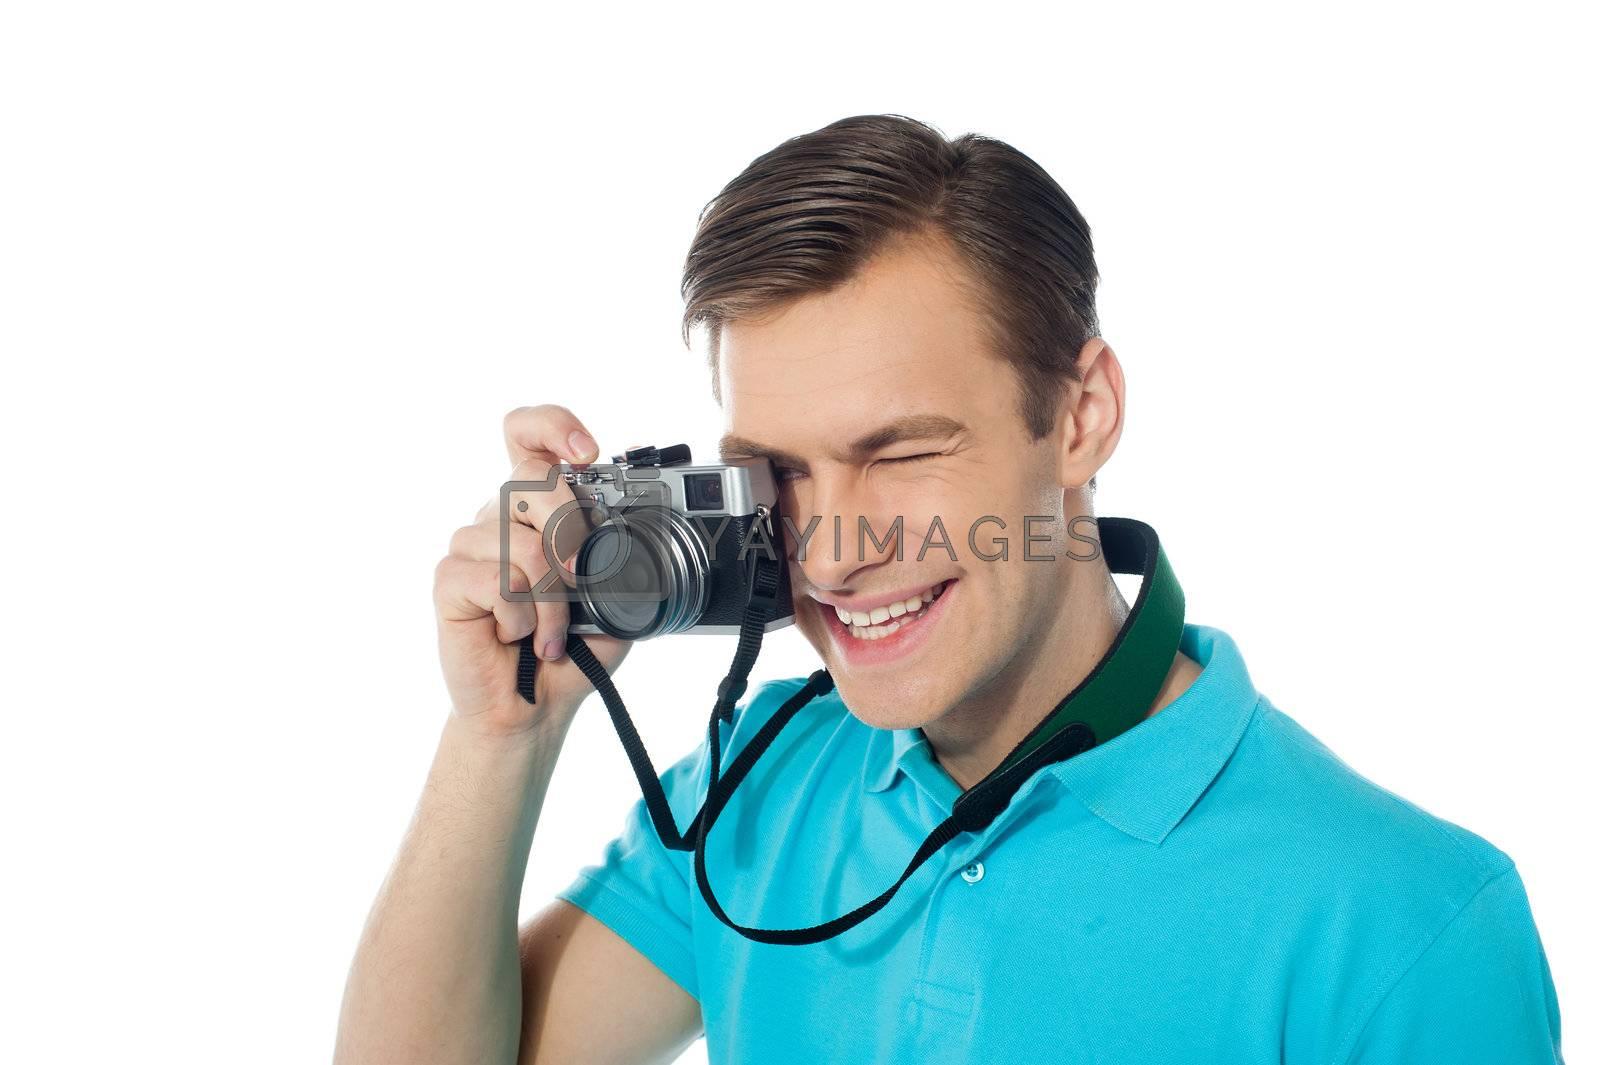 Youth photographer capturing images, studio shot